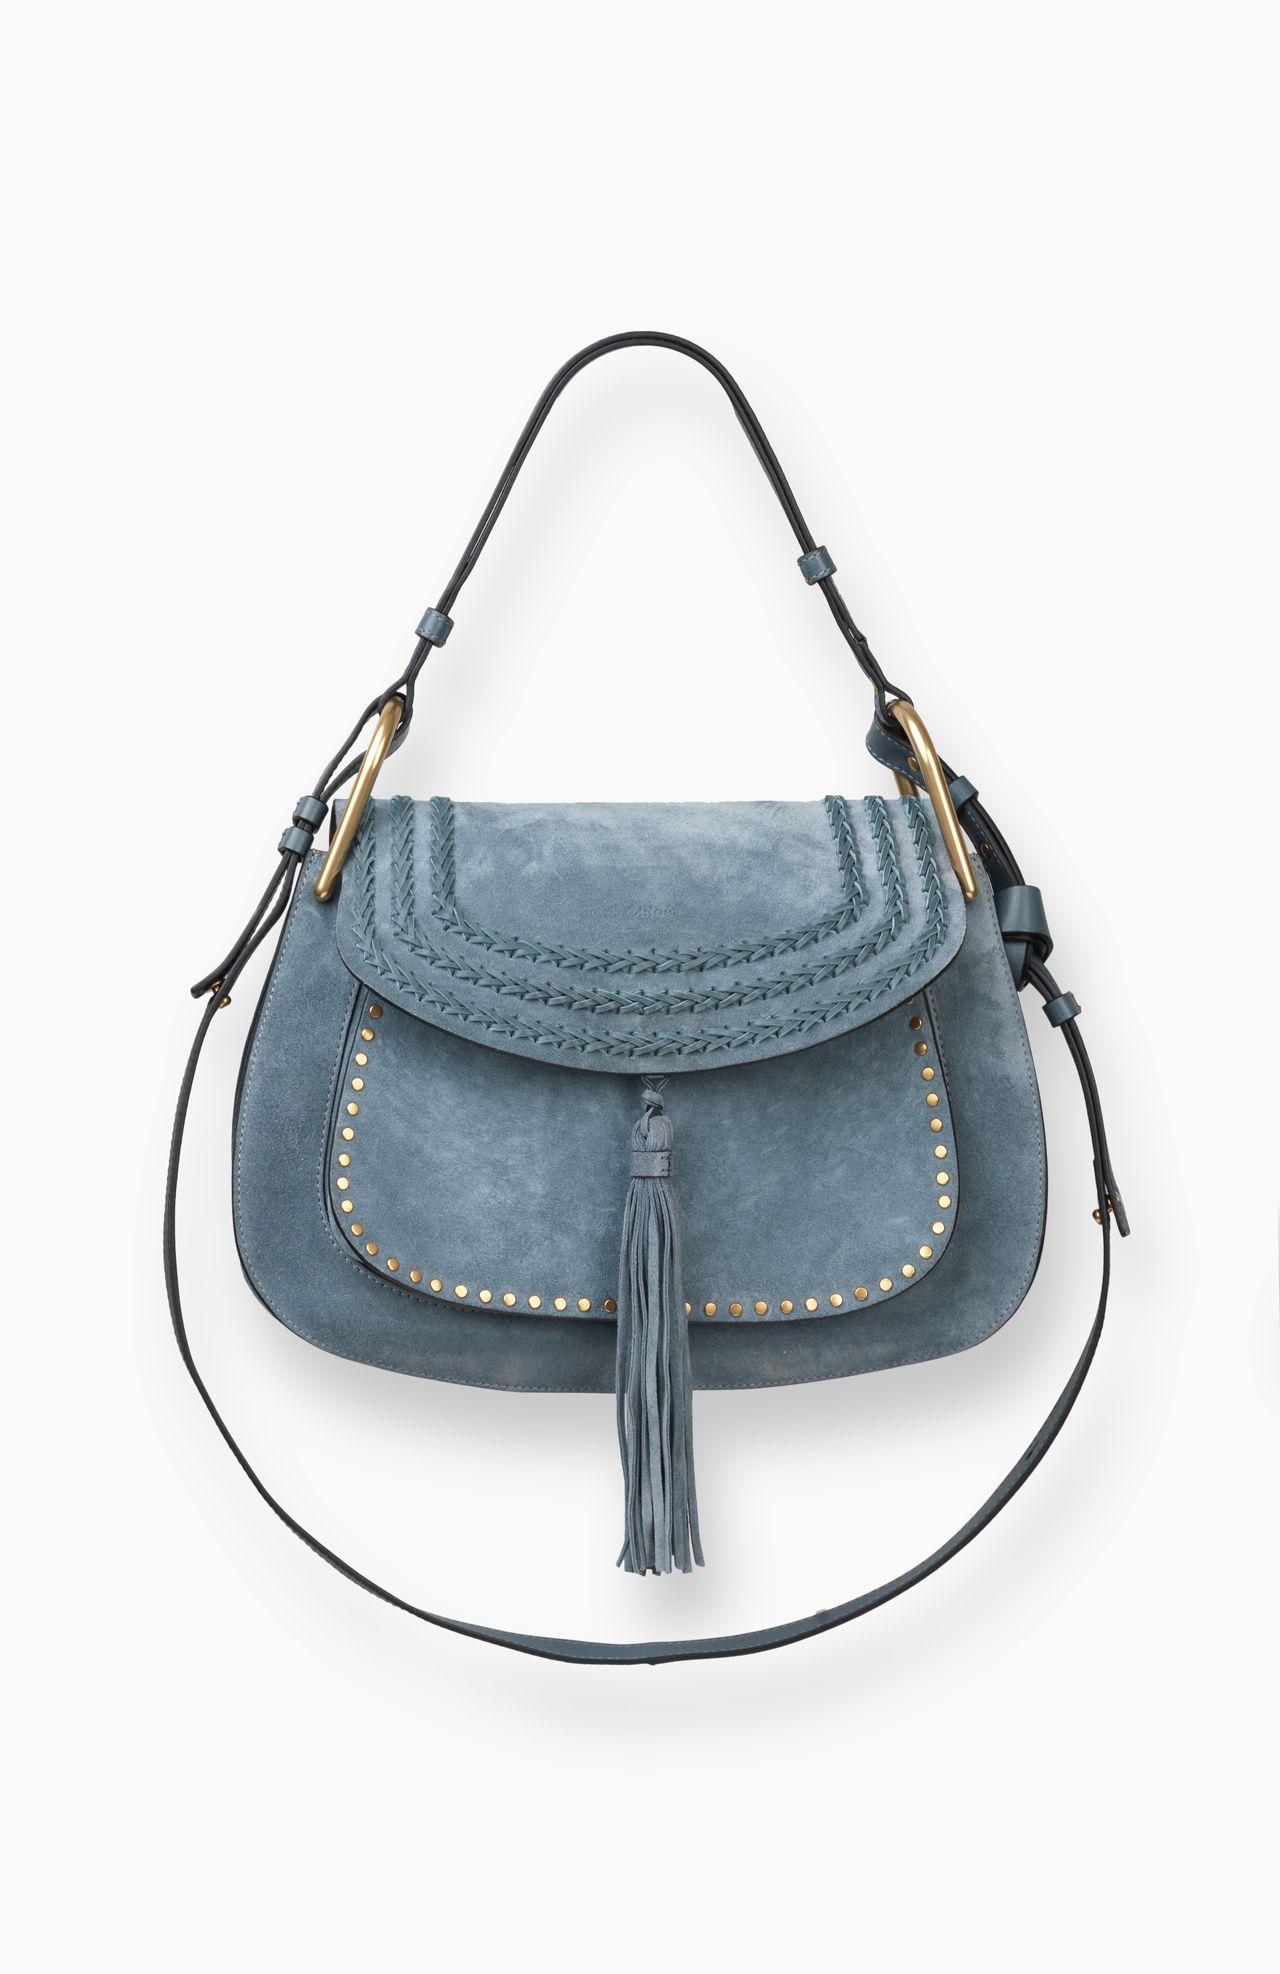 d5ad019edbfa 3S1221-H67-BFC Chloe Hudson Large Suede Bag! Cloudy Blue!❤ ❤️